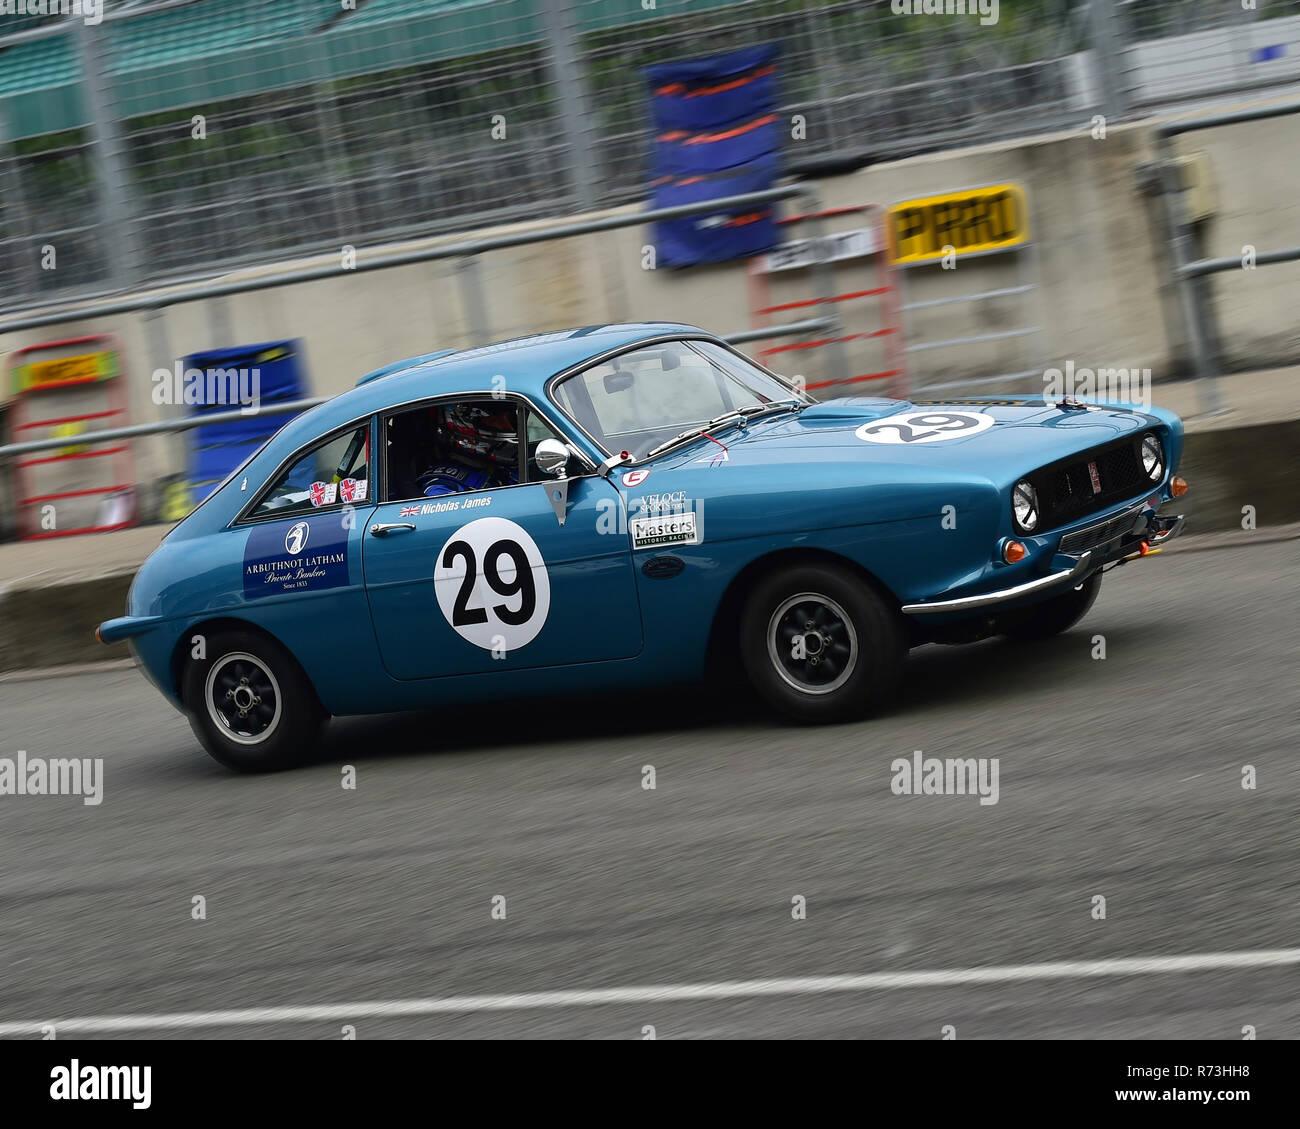 Matthew Draper, Nicholas James, Fletcher Ogle SX1000, RAC Tourist Trophy, historic cars, pre-63 GT, Silverstone Classic 2016, 60's cars, Chris McEvoy, - Stock Image